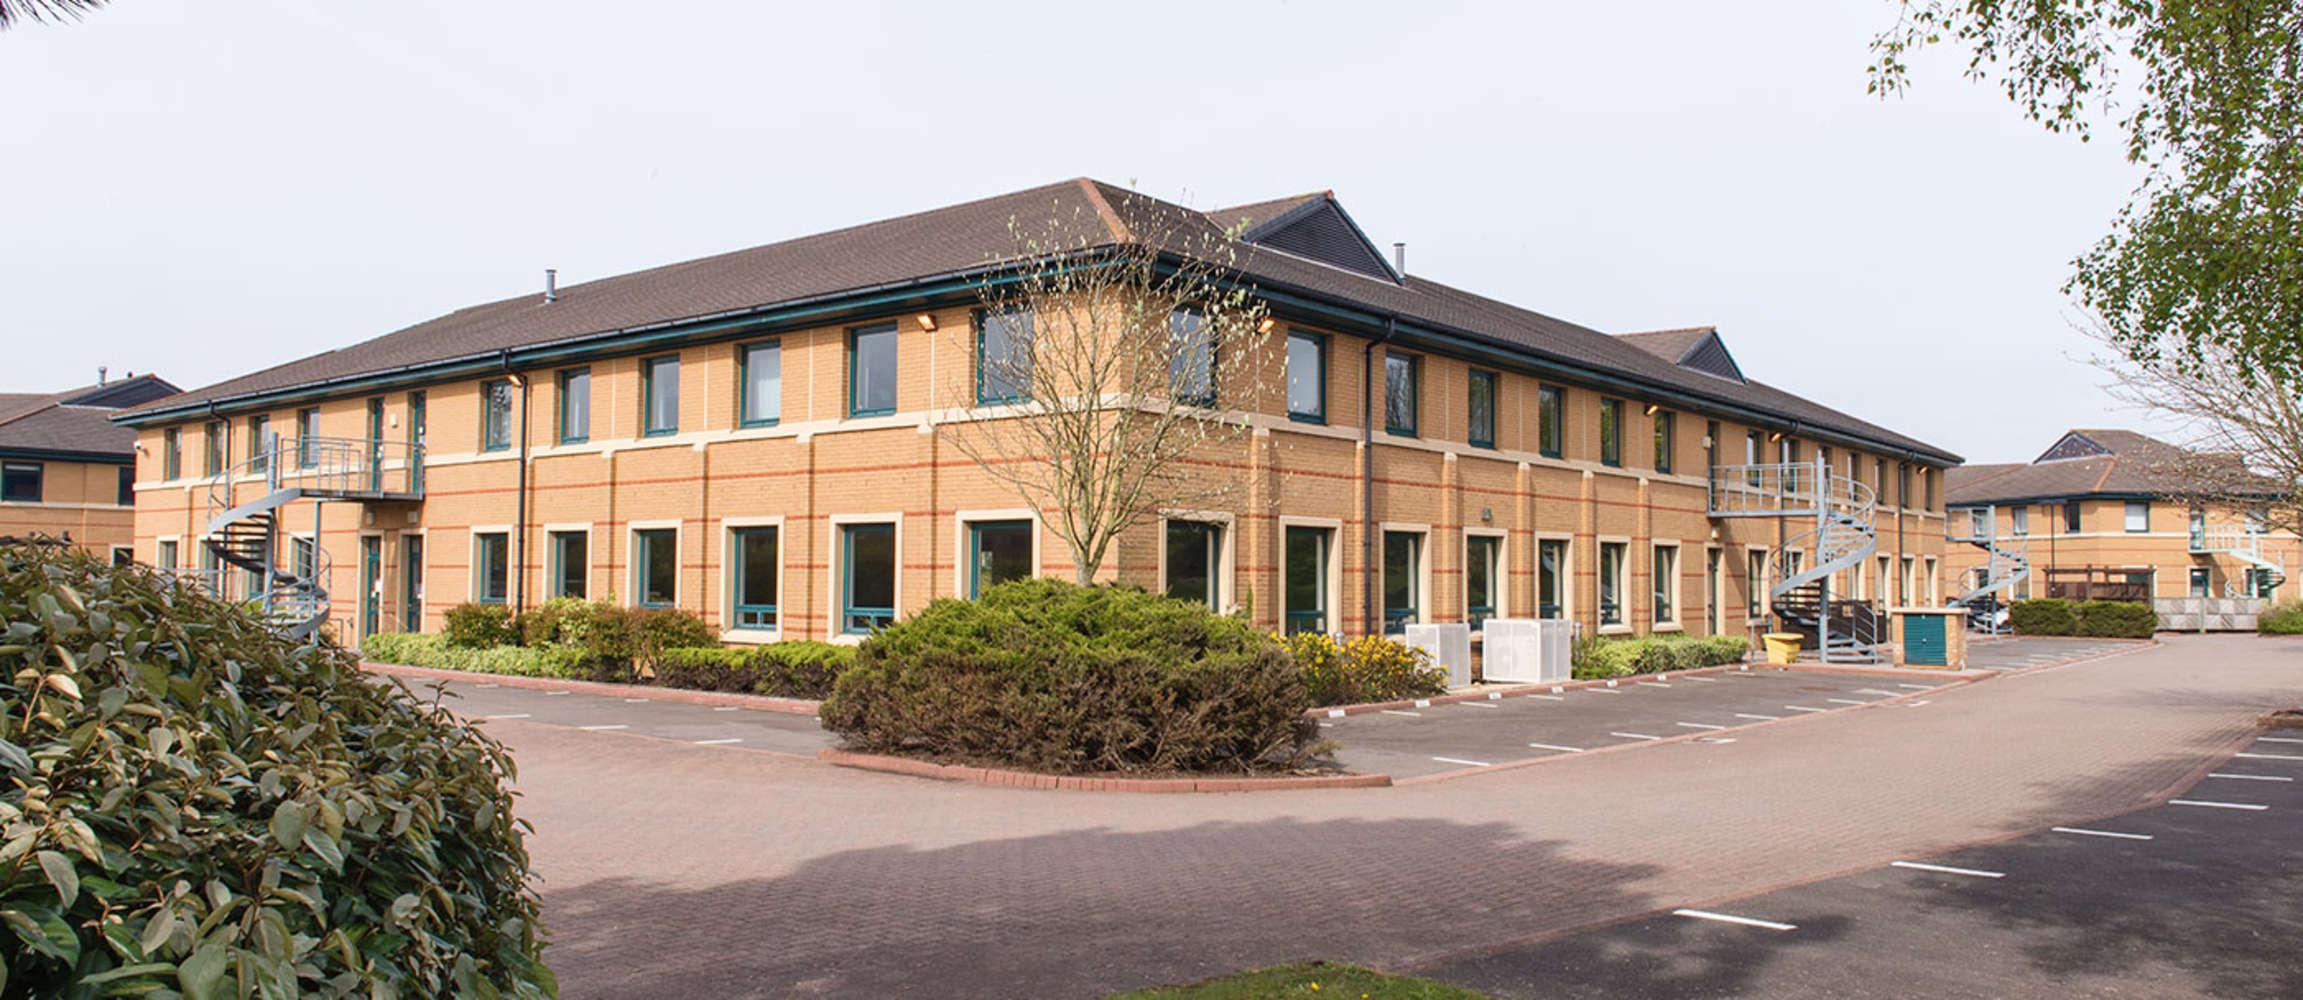 Office Birmingham, B37 7YE - 2665 Kings Court, Birmingham Business Park - 3